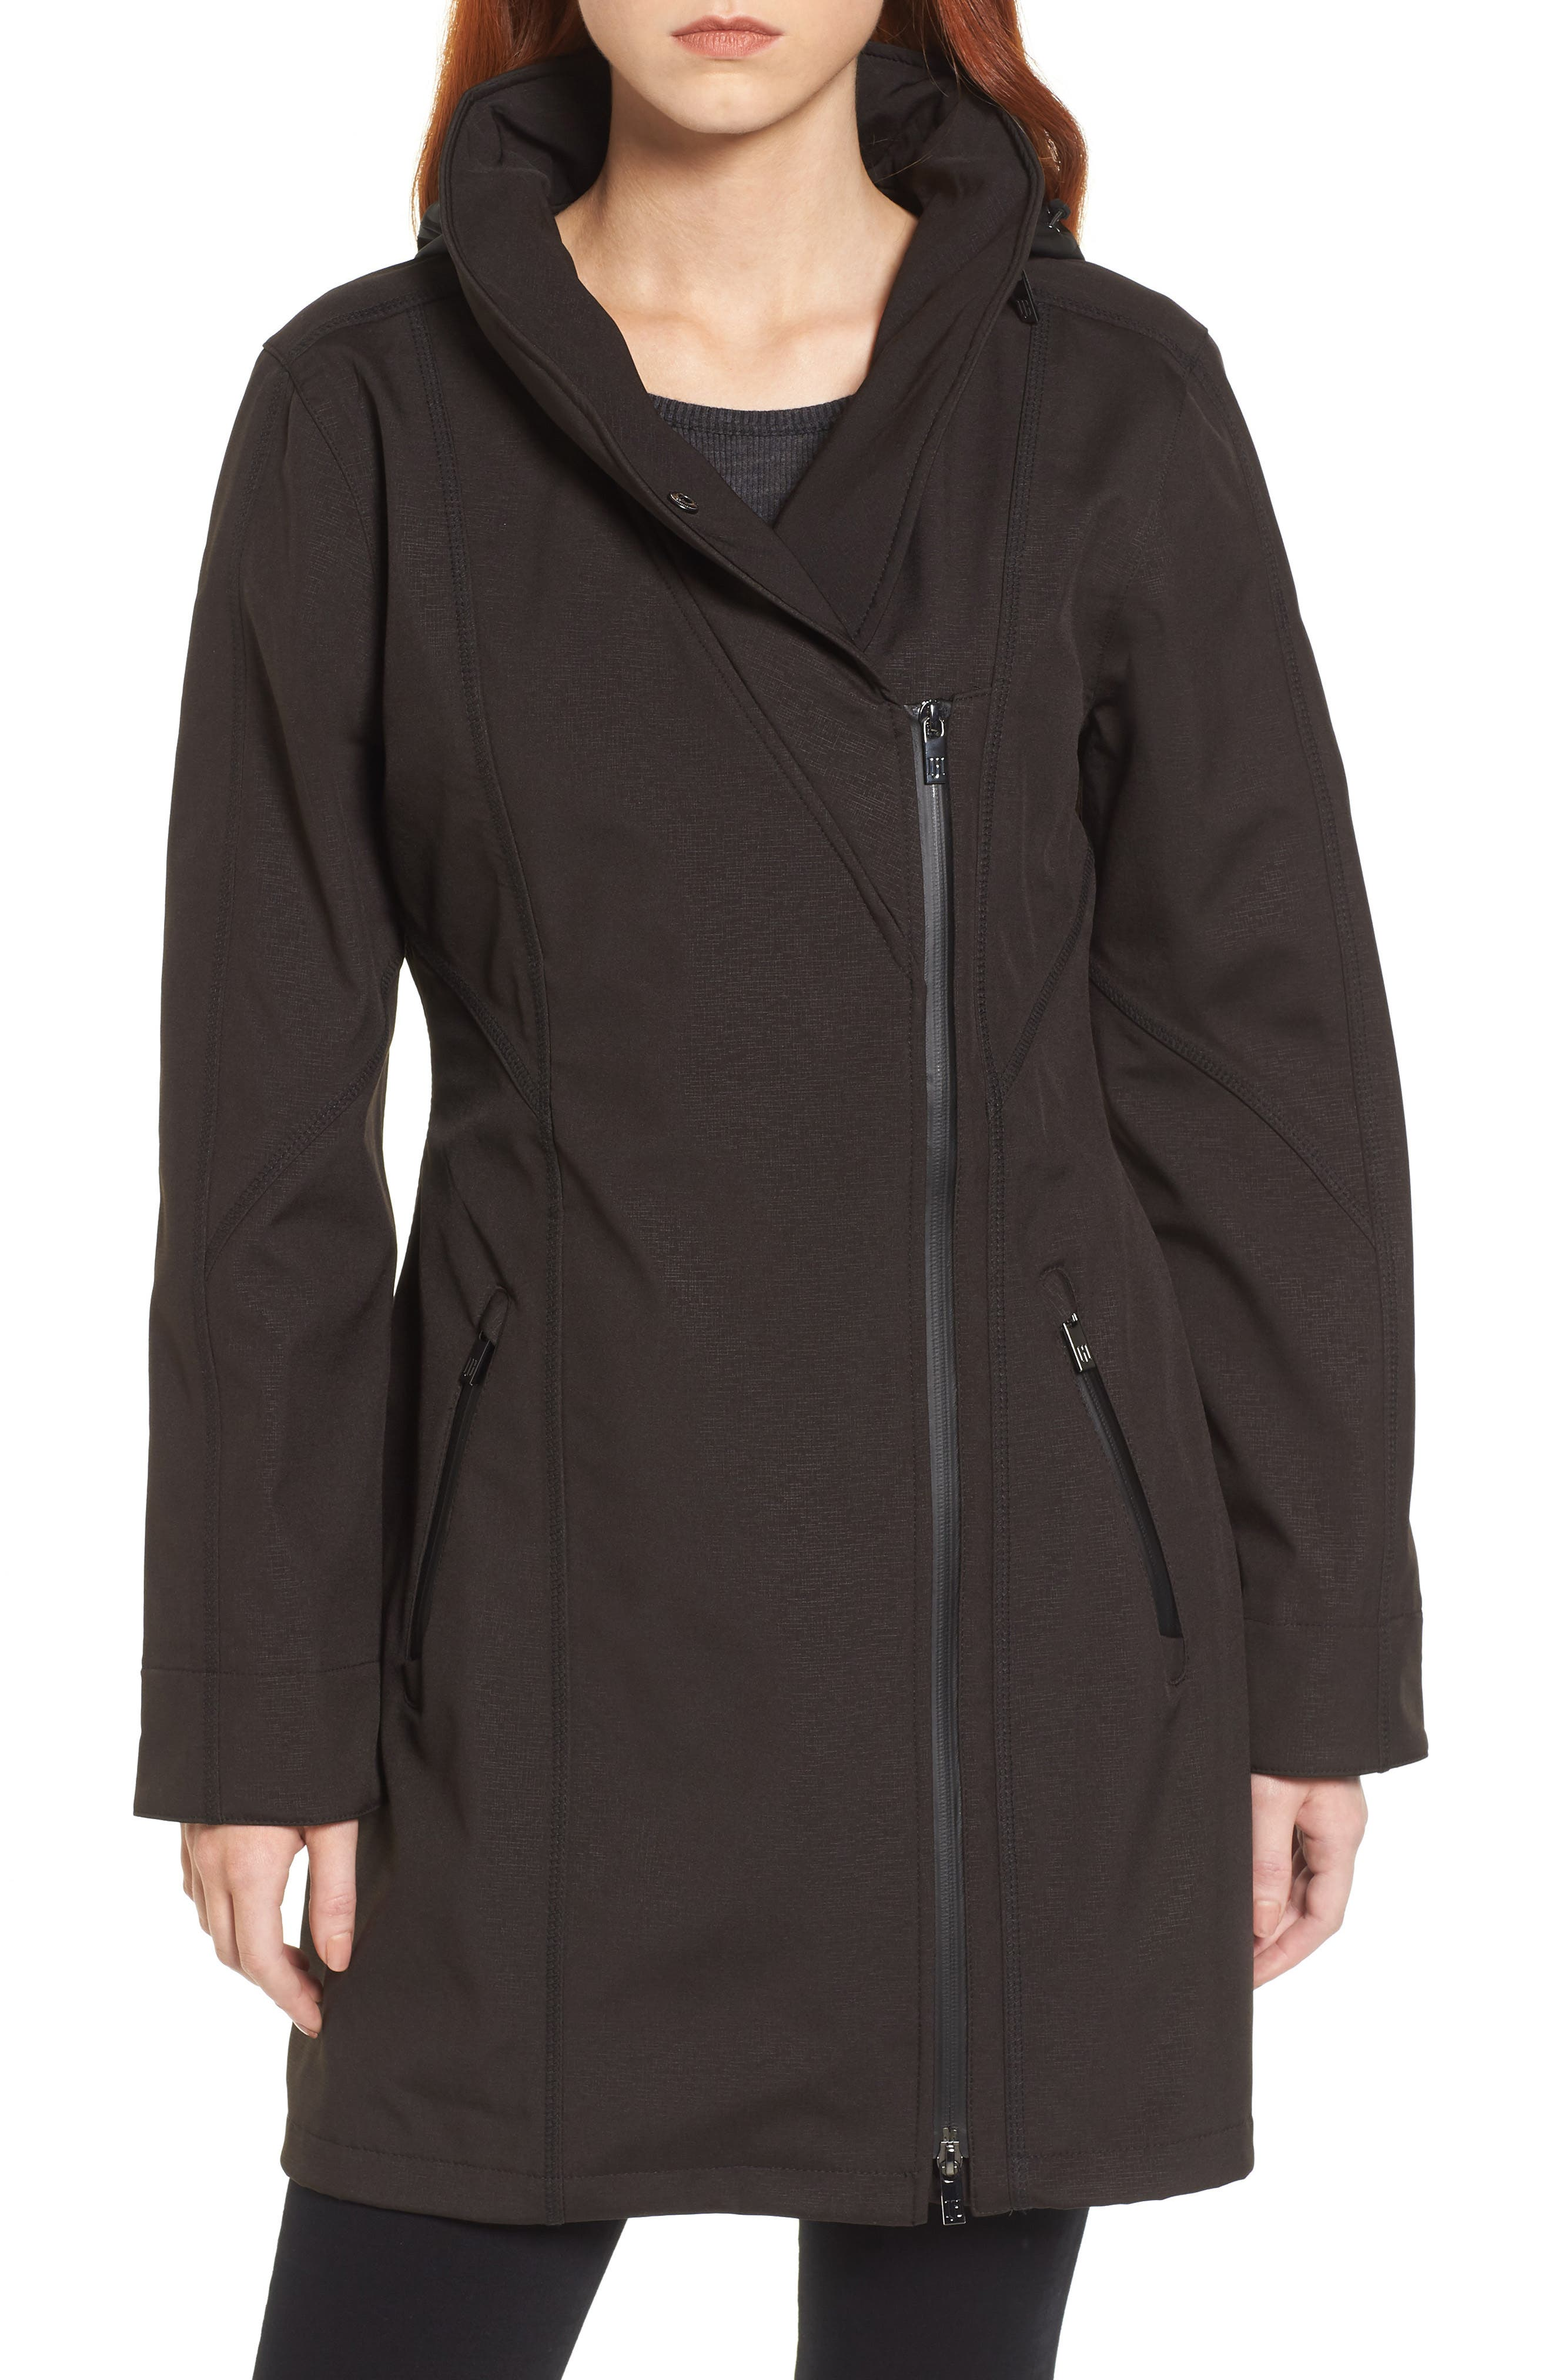 Hornbaek Soft Shell Raincoat,                             Main thumbnail 1, color,                             001